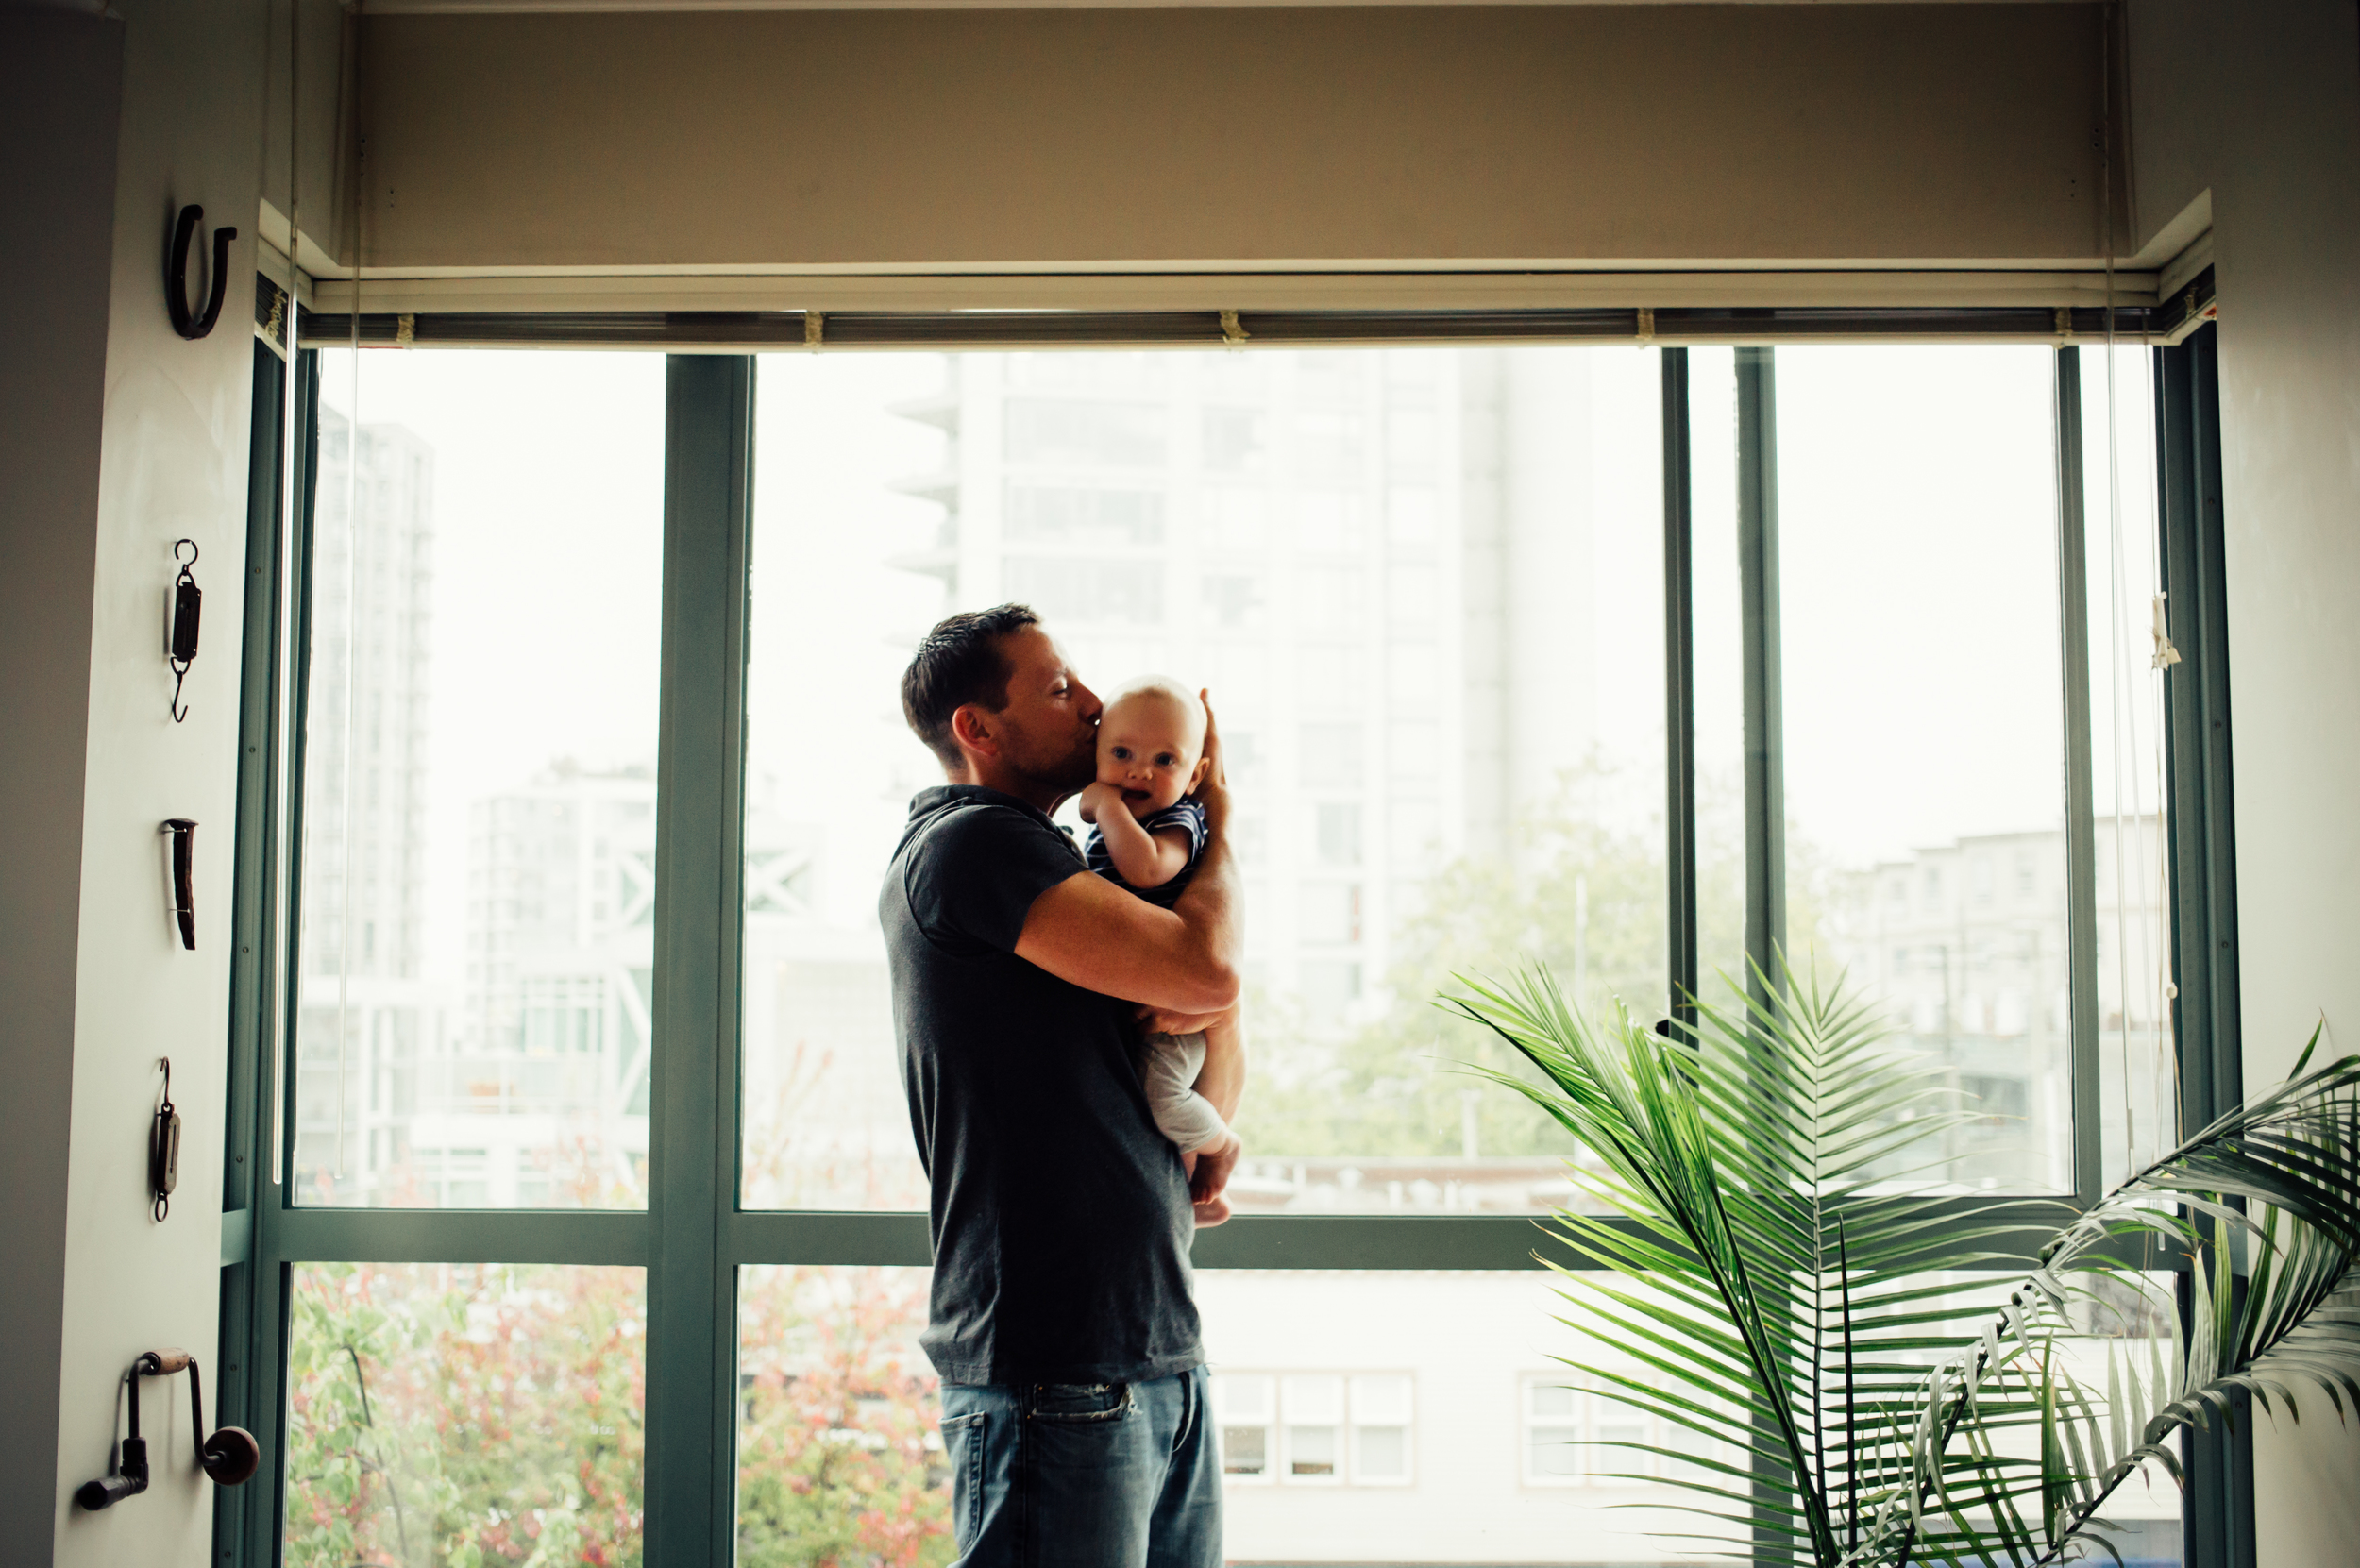 dogwoodphotography_photographer_vancouver_baby_family_babyangus-25.jpg